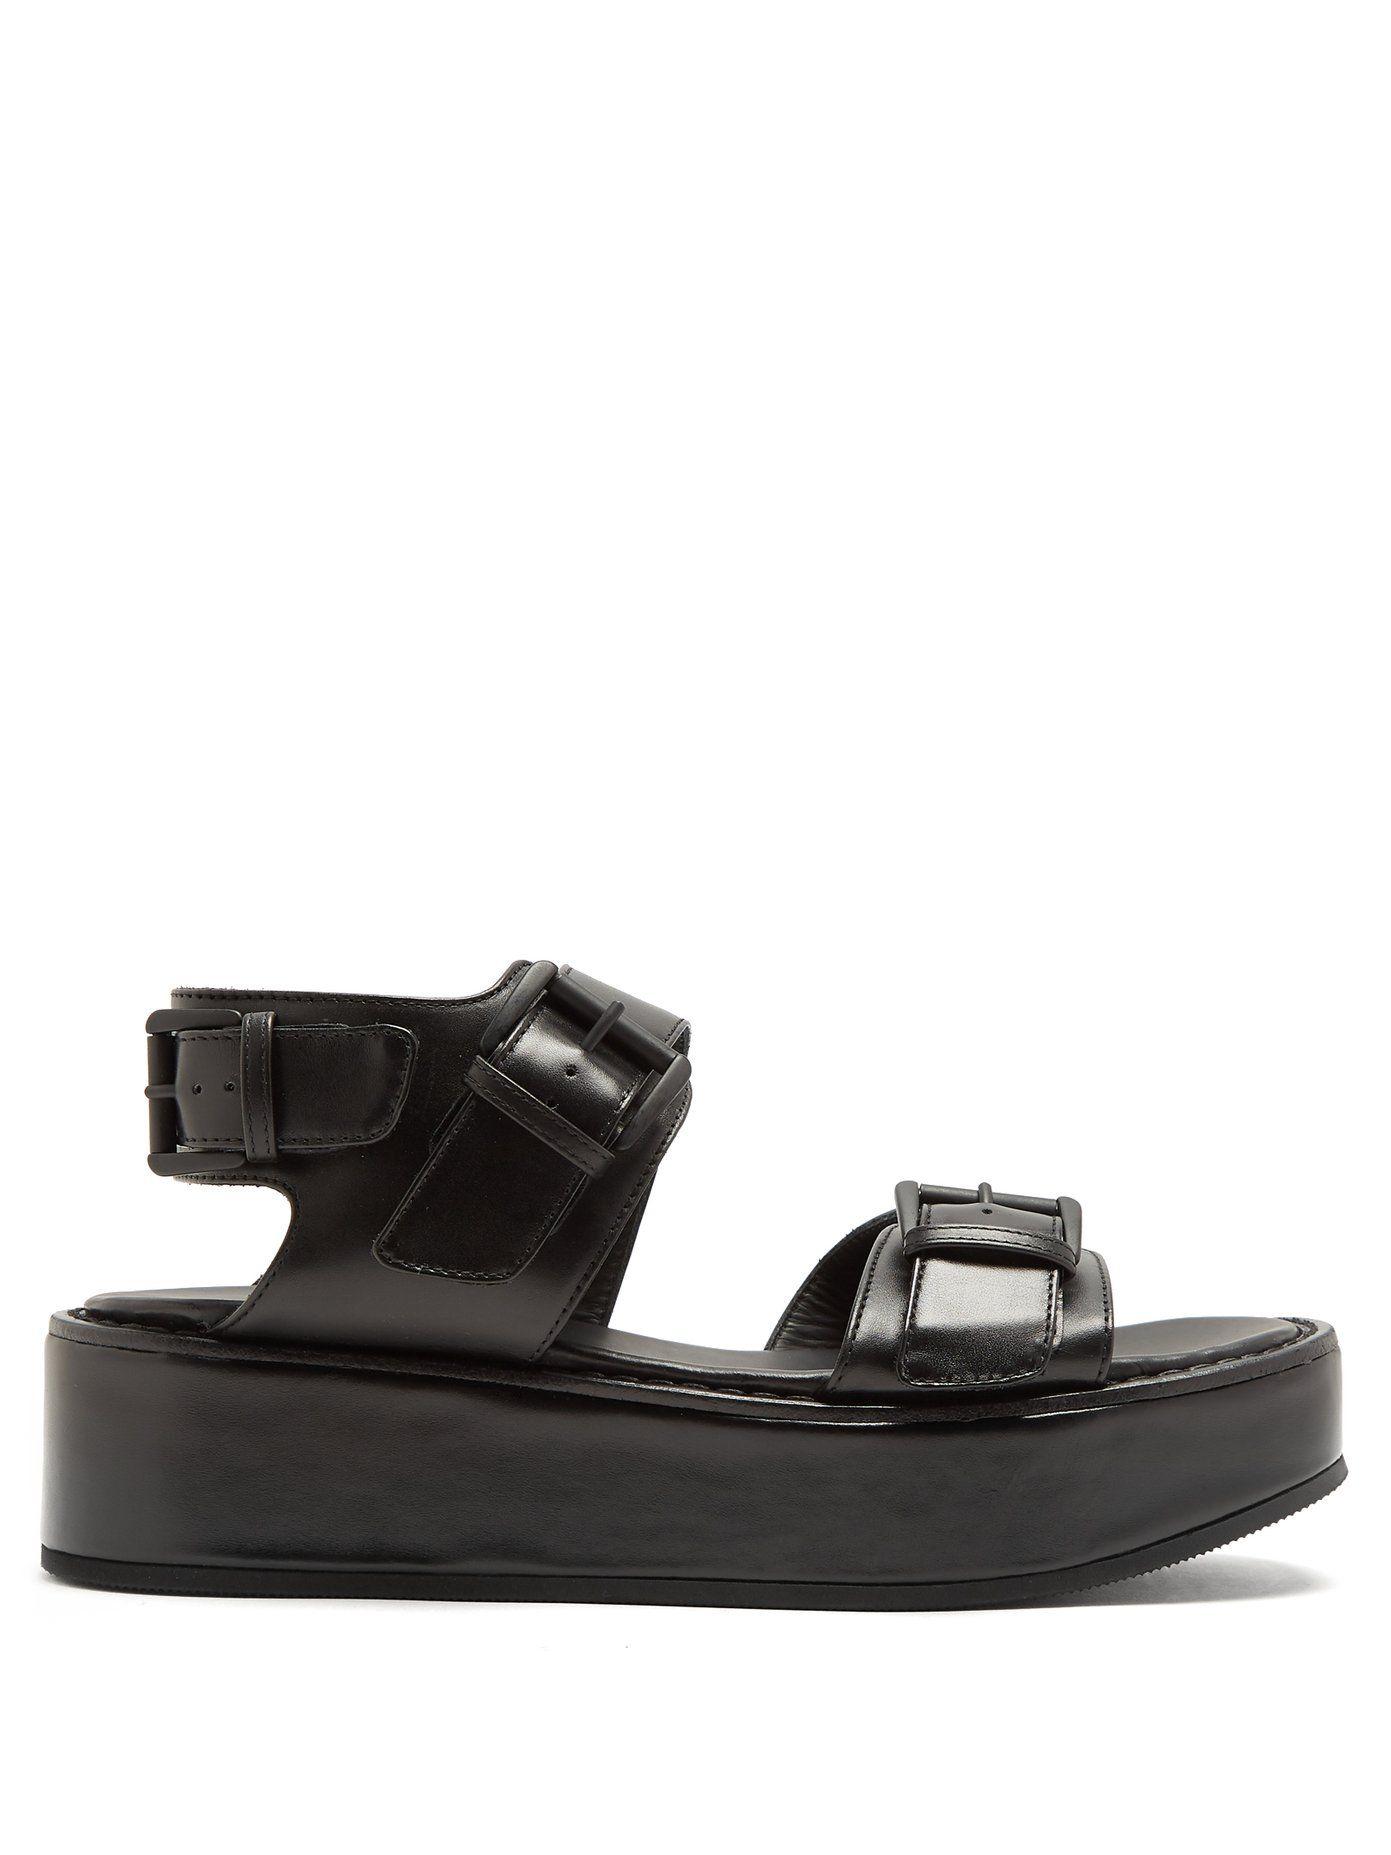 20ae0257ffdd Ann Demeulemeester Black Flatform 50 Leather Sandals in 2019 ...